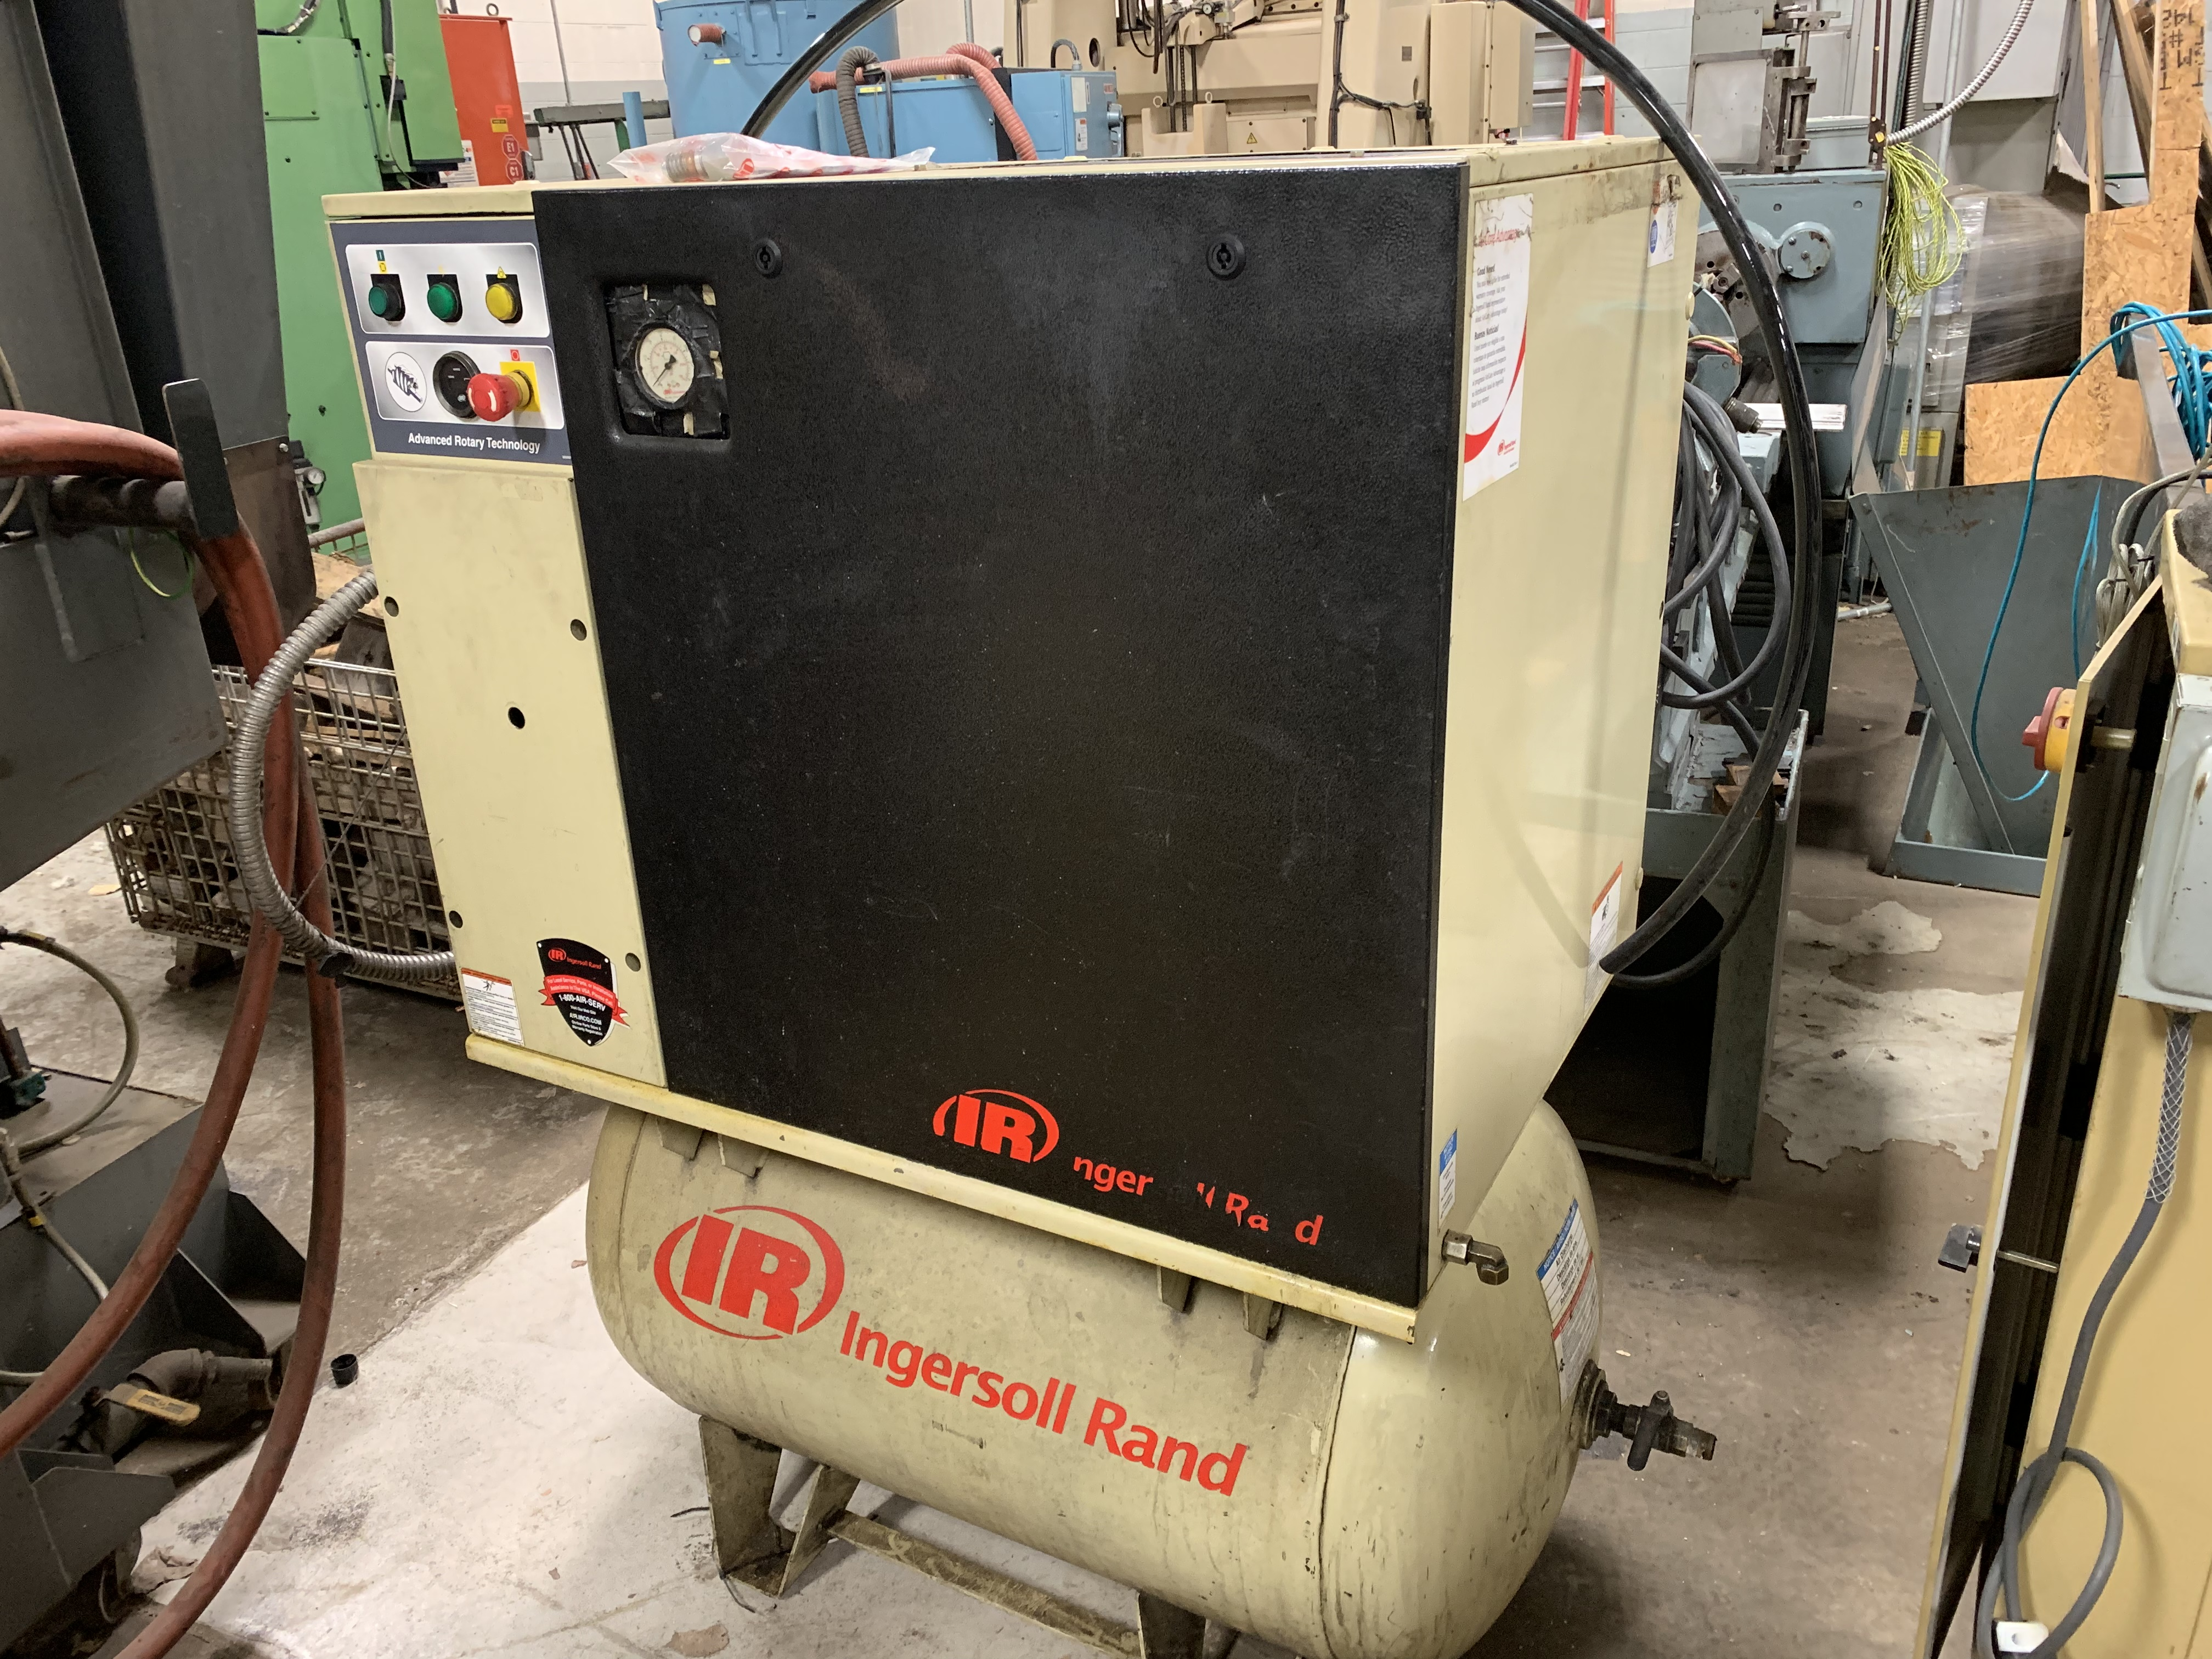 INGERSOL RAND UP6-10-150 10HP SCREW COMPRESSOR TANK MOUNTED